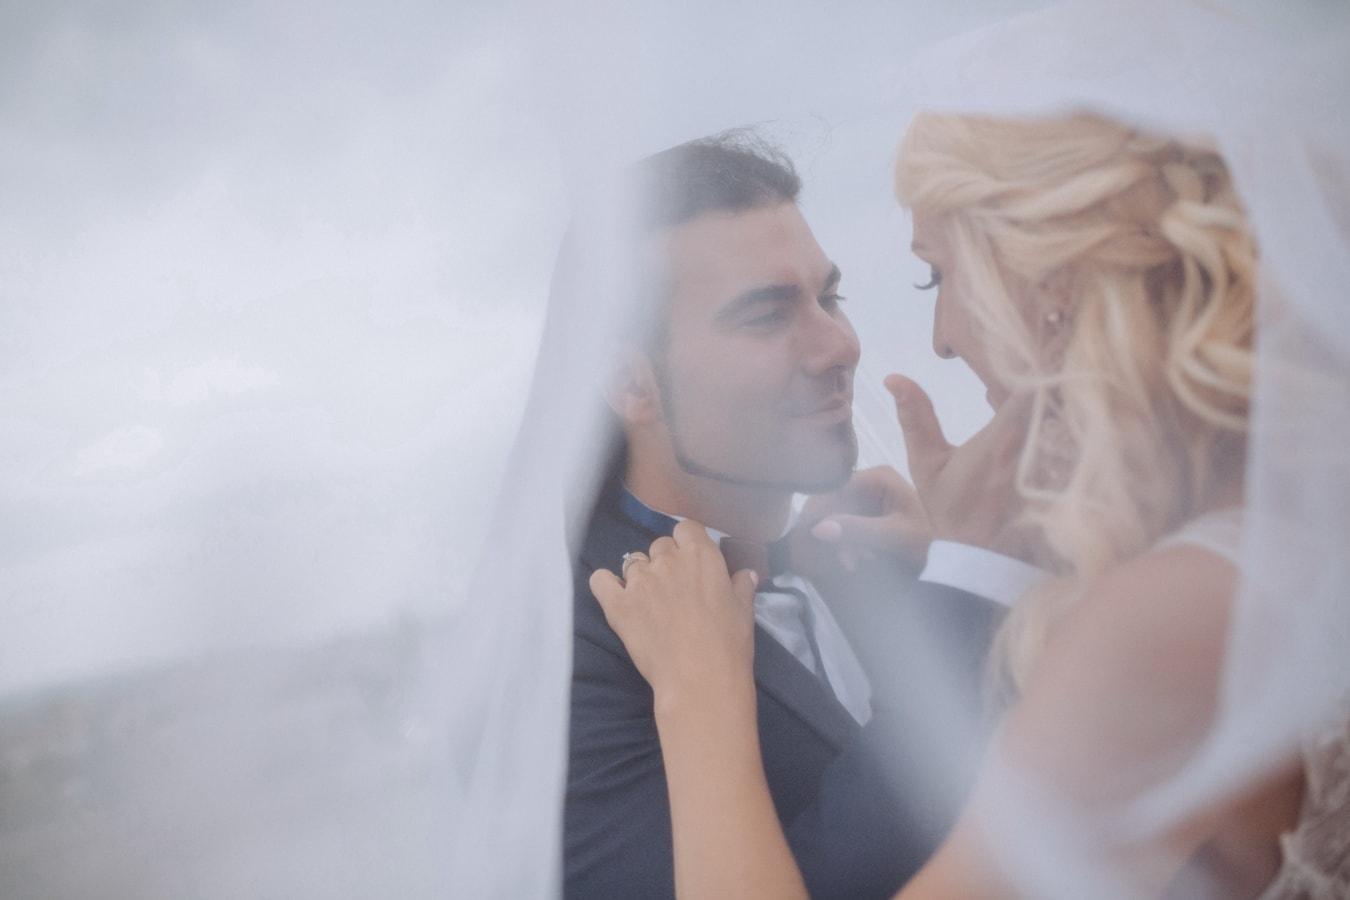 groom, bride, underneath, wedding dress, veil, woman, portrait, love, wedding, romance